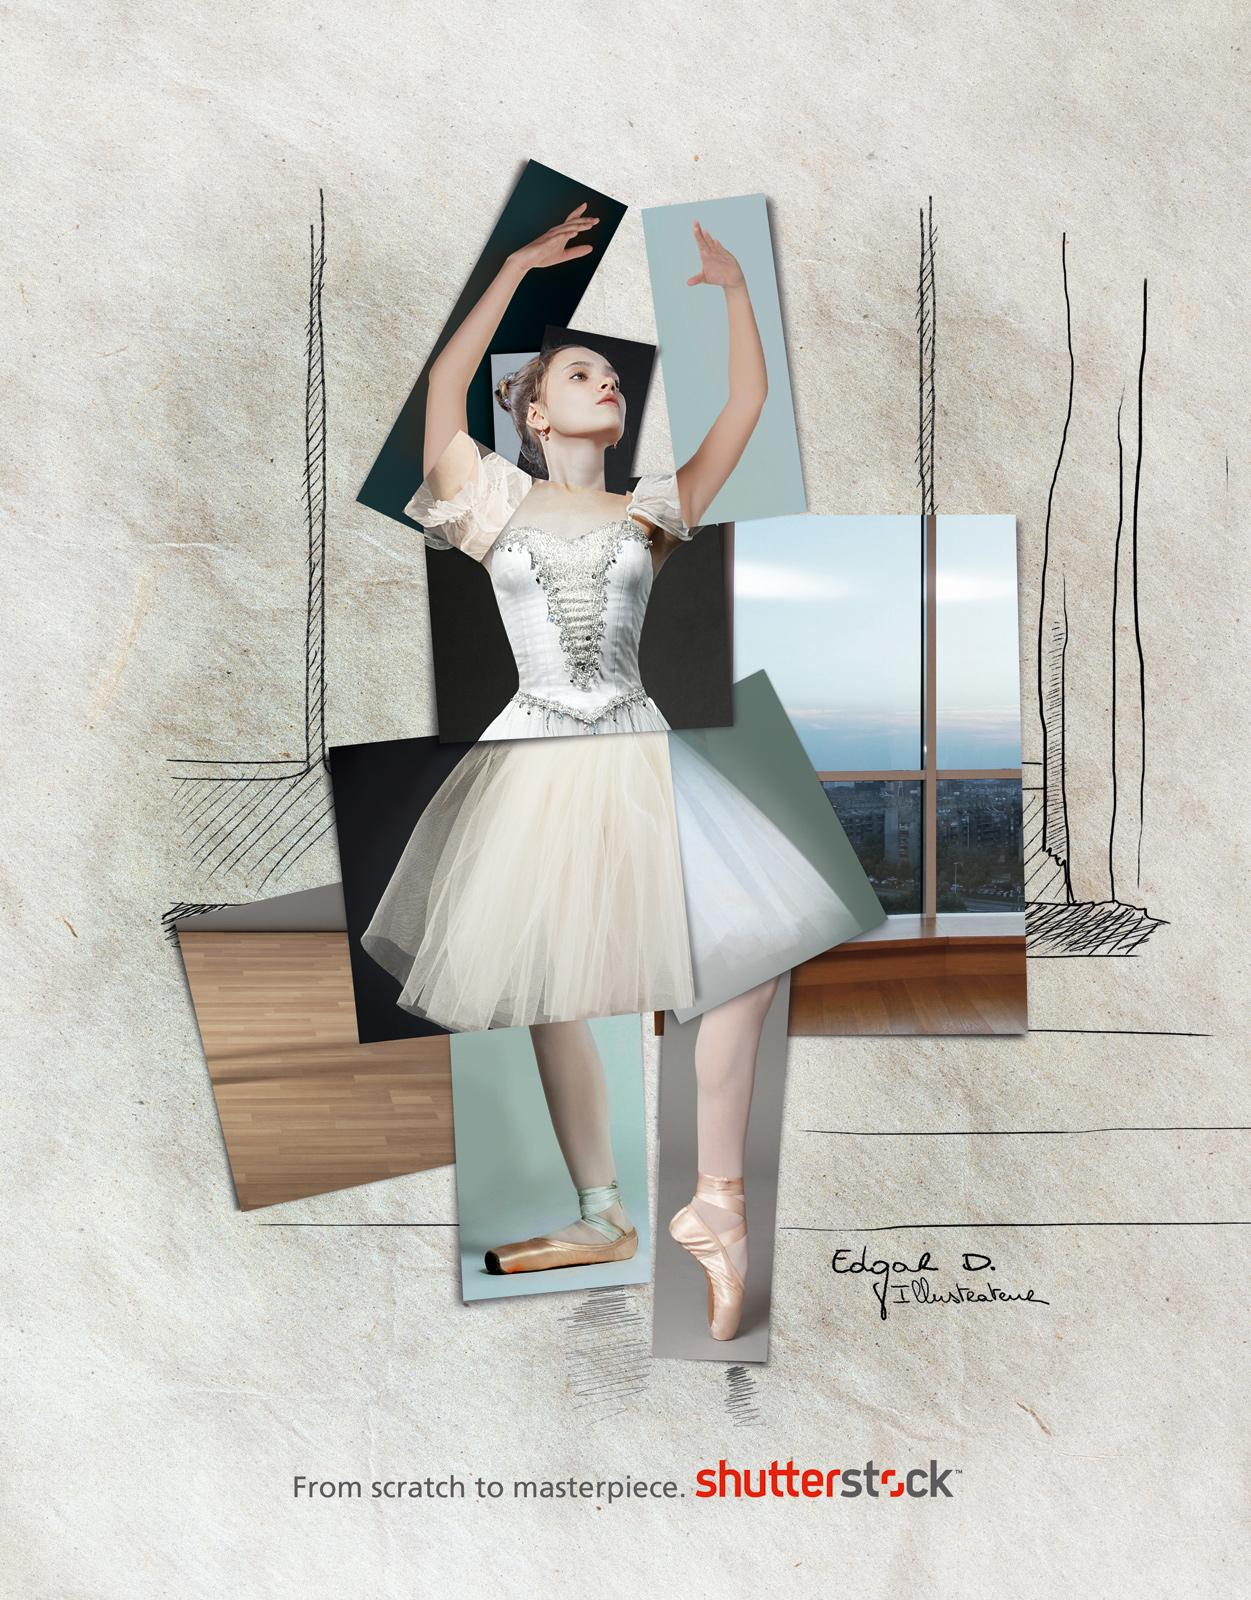 Shutterstock Print Ad -  Edgar Degas